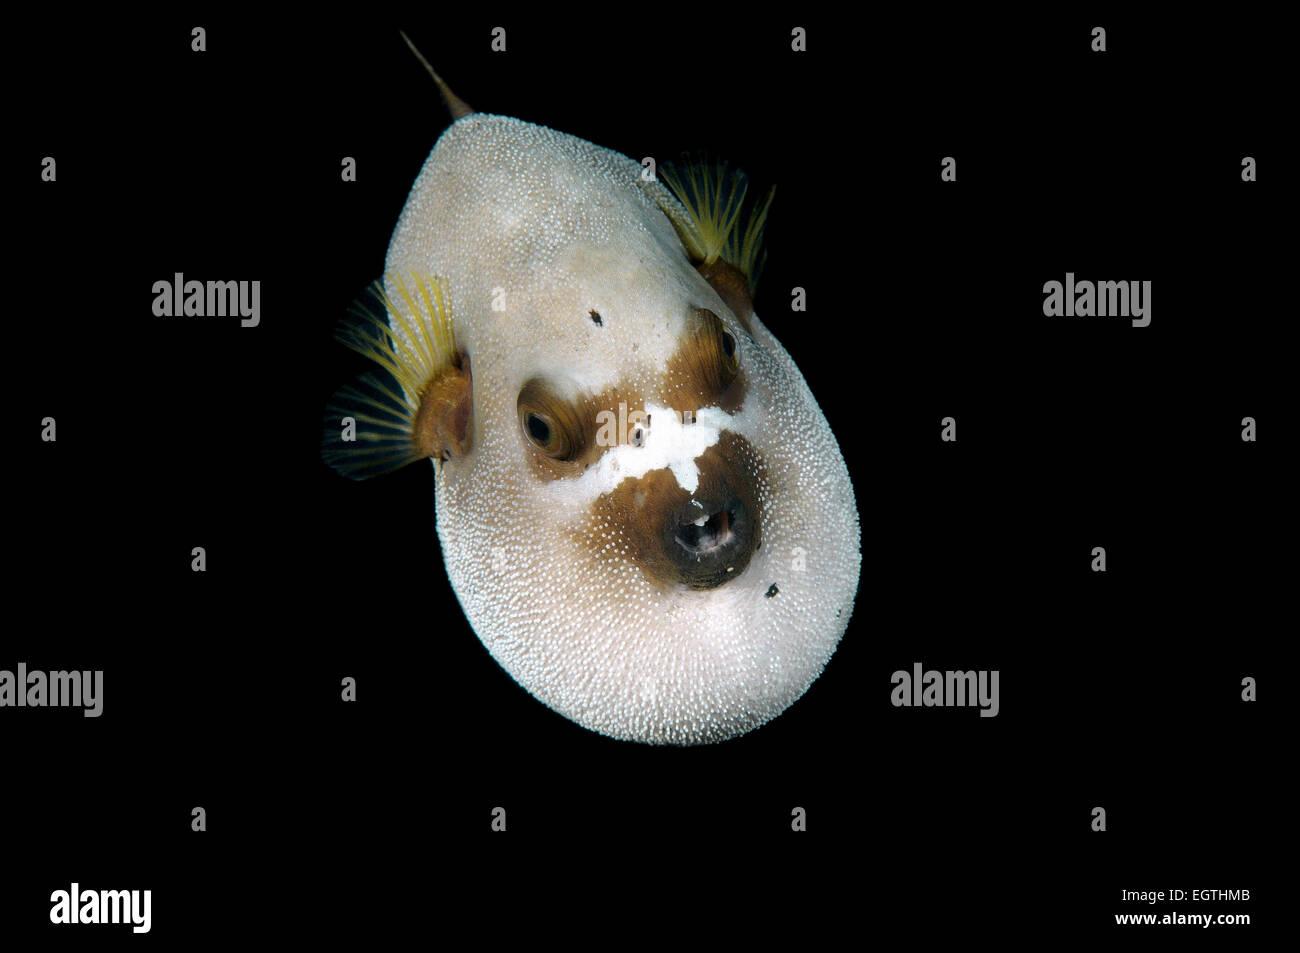 Blackspotted puffer or  dog-faced puffer (Arothron nigropunctatus) Bohol Sea, Cebu, Philippines Stock Photo